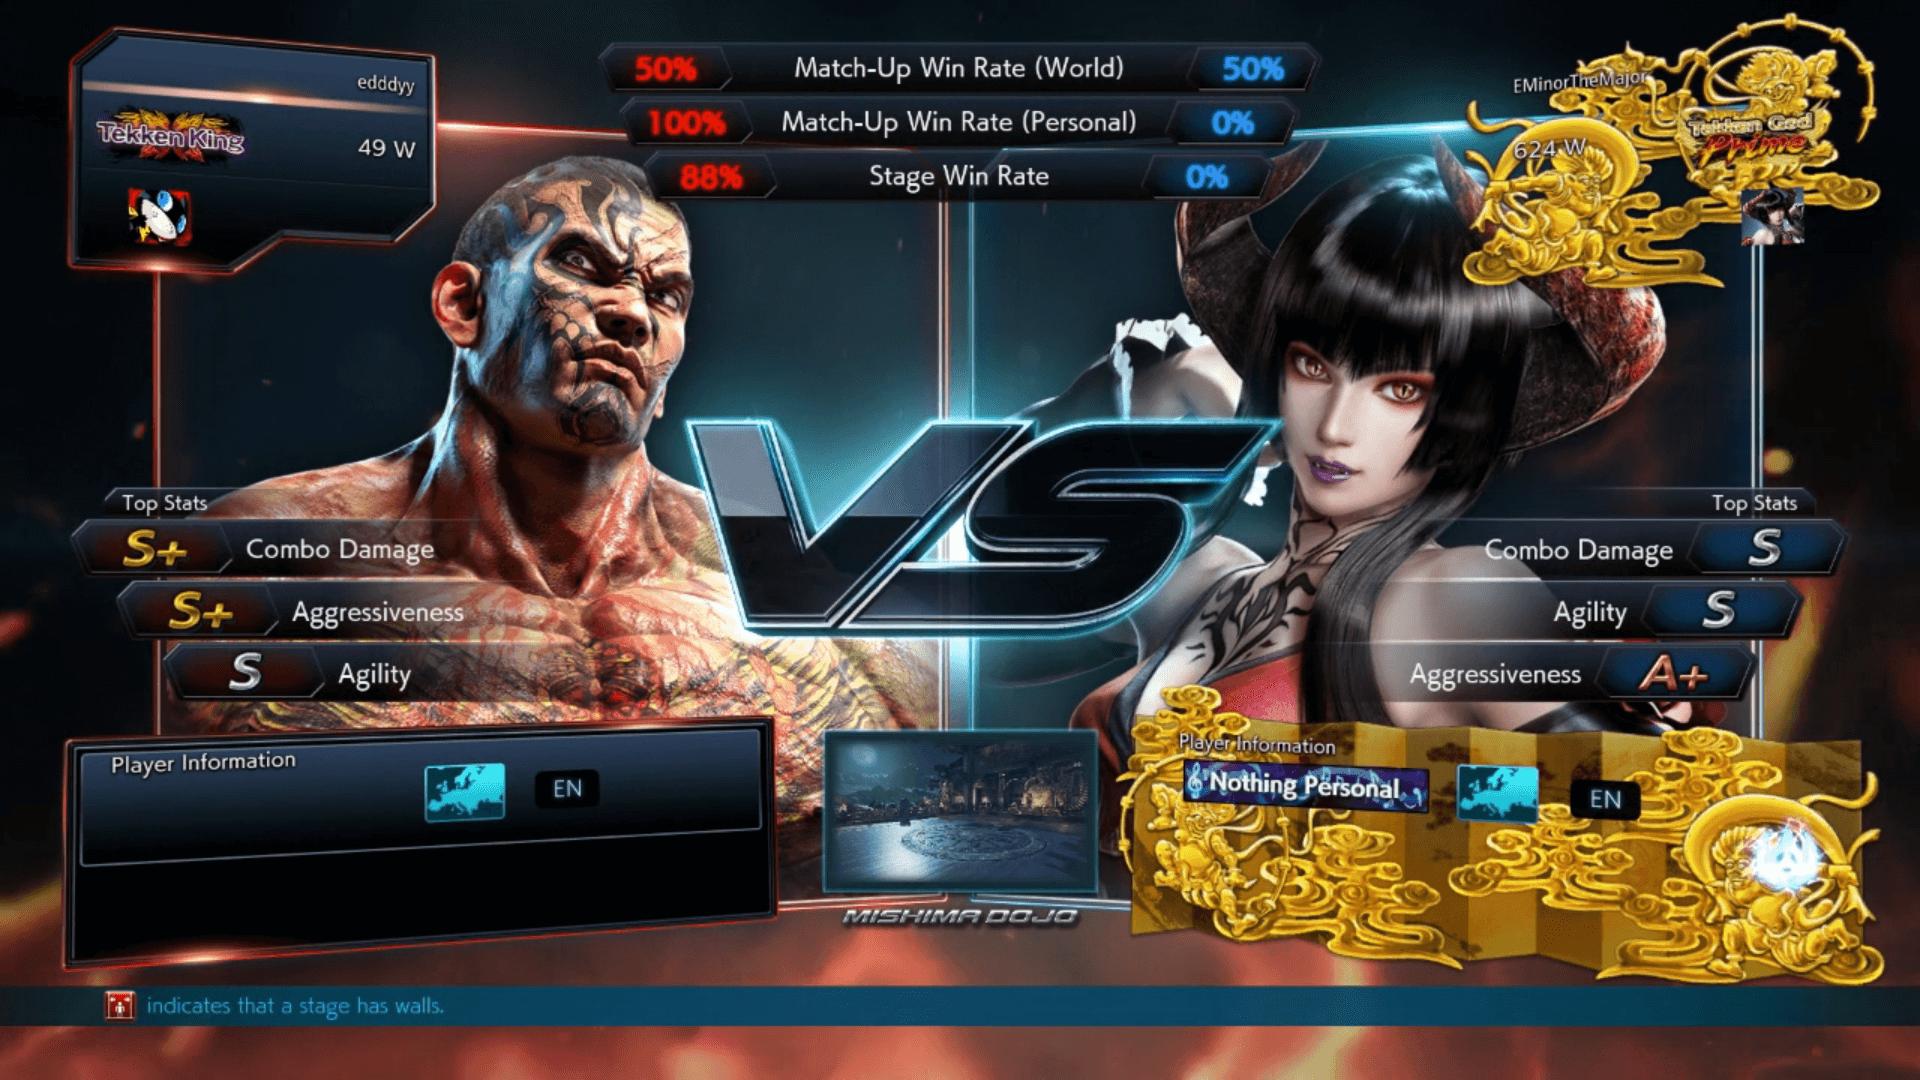 New Season has Started - The first event of Tekken 7 Online Challenge